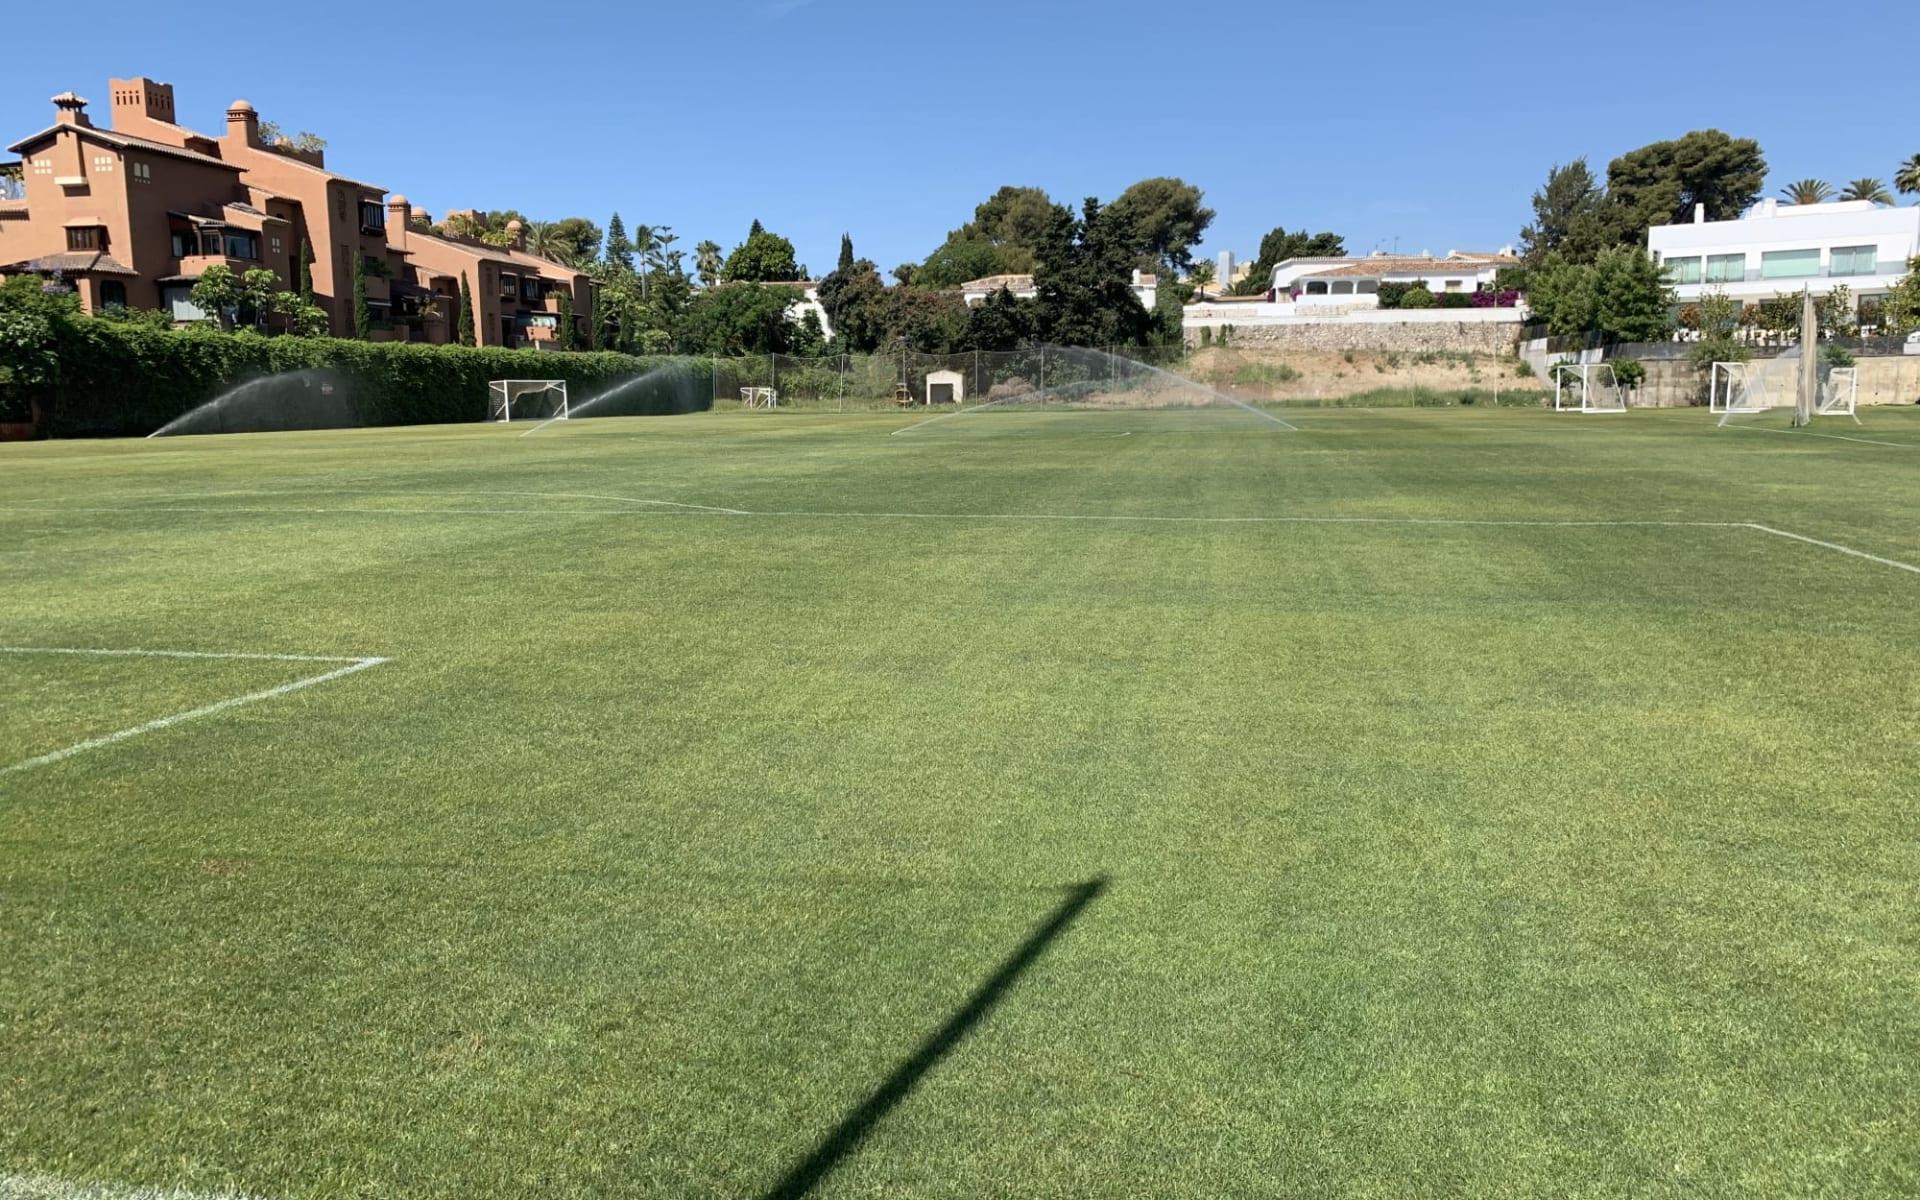 Estepona - Sol Marbella Atalaya Park ab Malaga: Atalaya Park 3